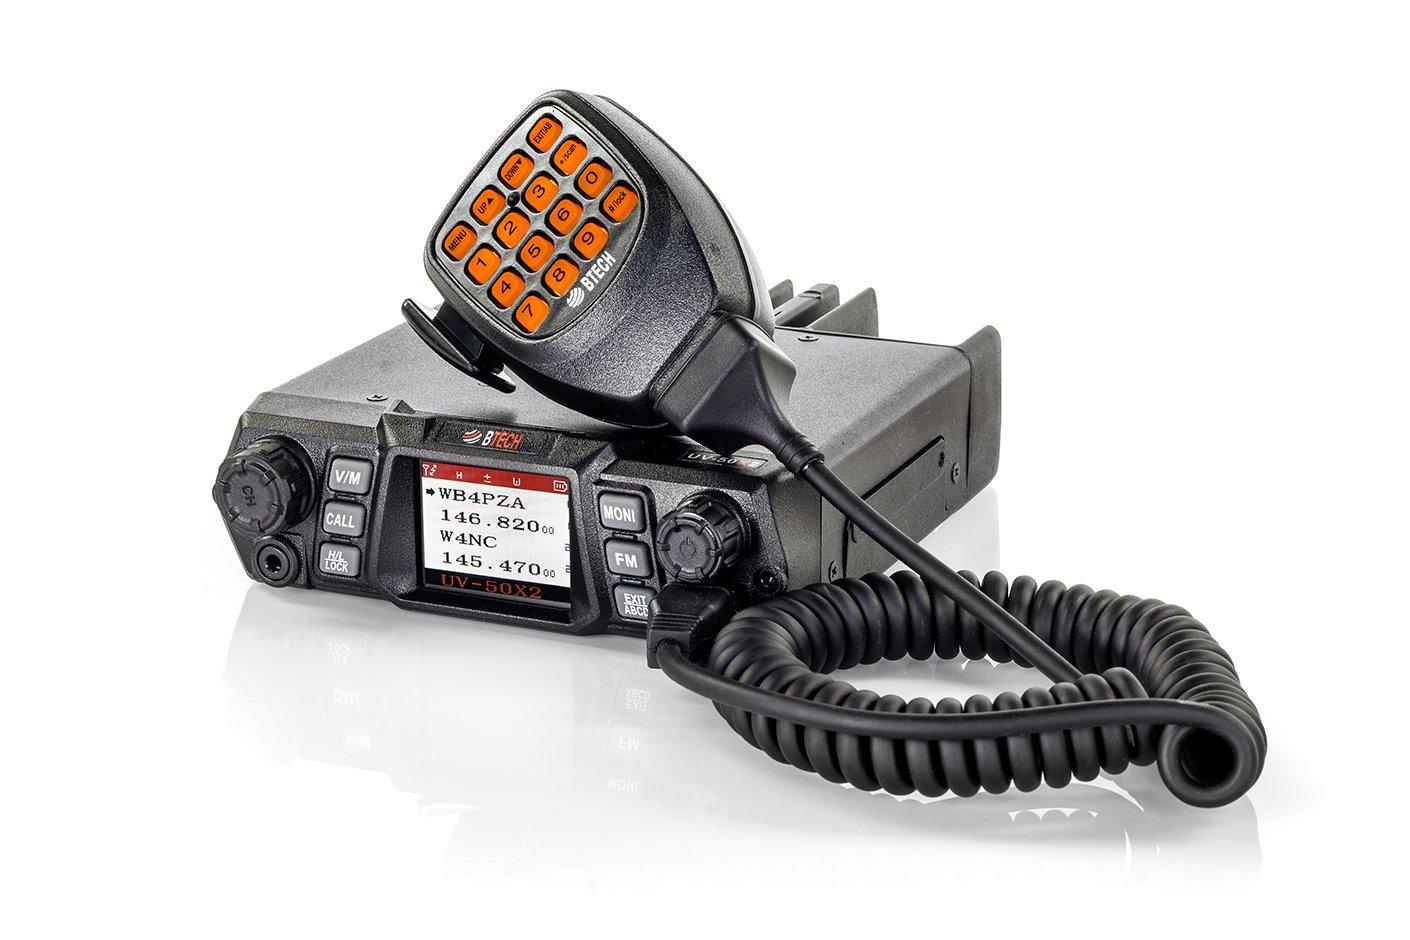 BTECH Mobile UV-50X2 50 Watt Dual Band Base, Mobile Radio: 136-174mhz (VHF) 400-520mhz (UHF) Amateur (Ham) by BTECH